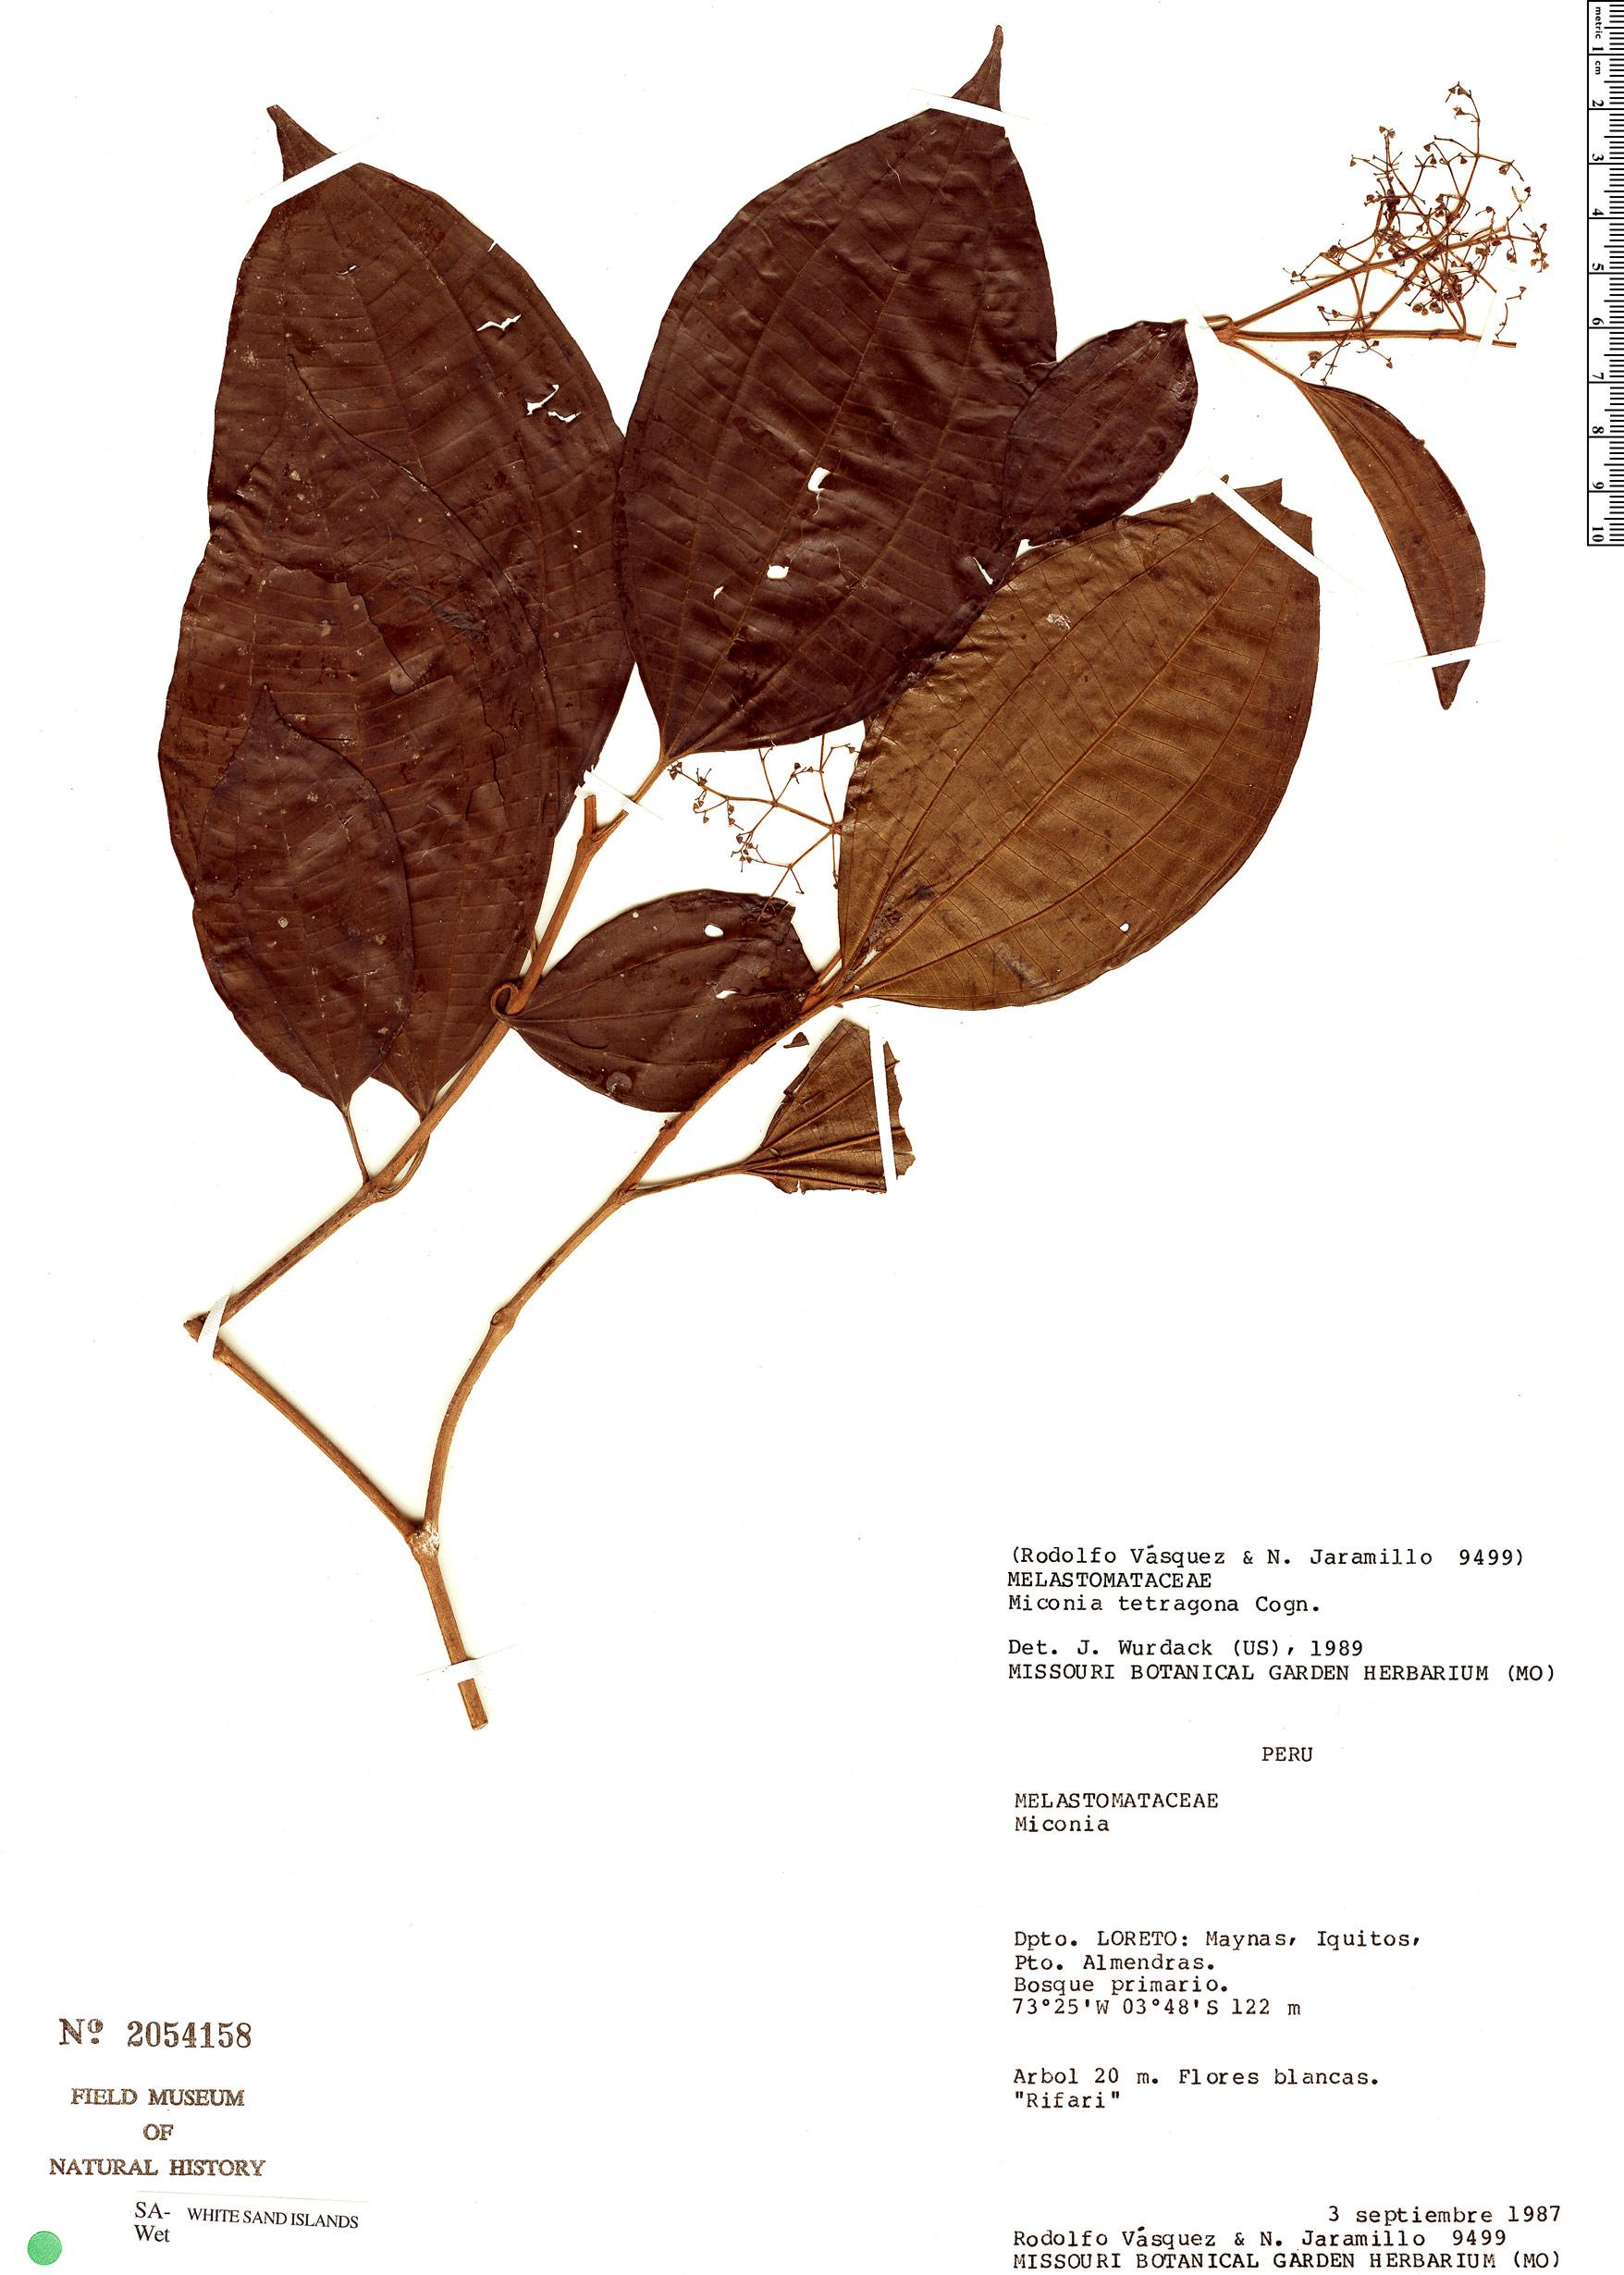 Espécime: Miconia tetragona